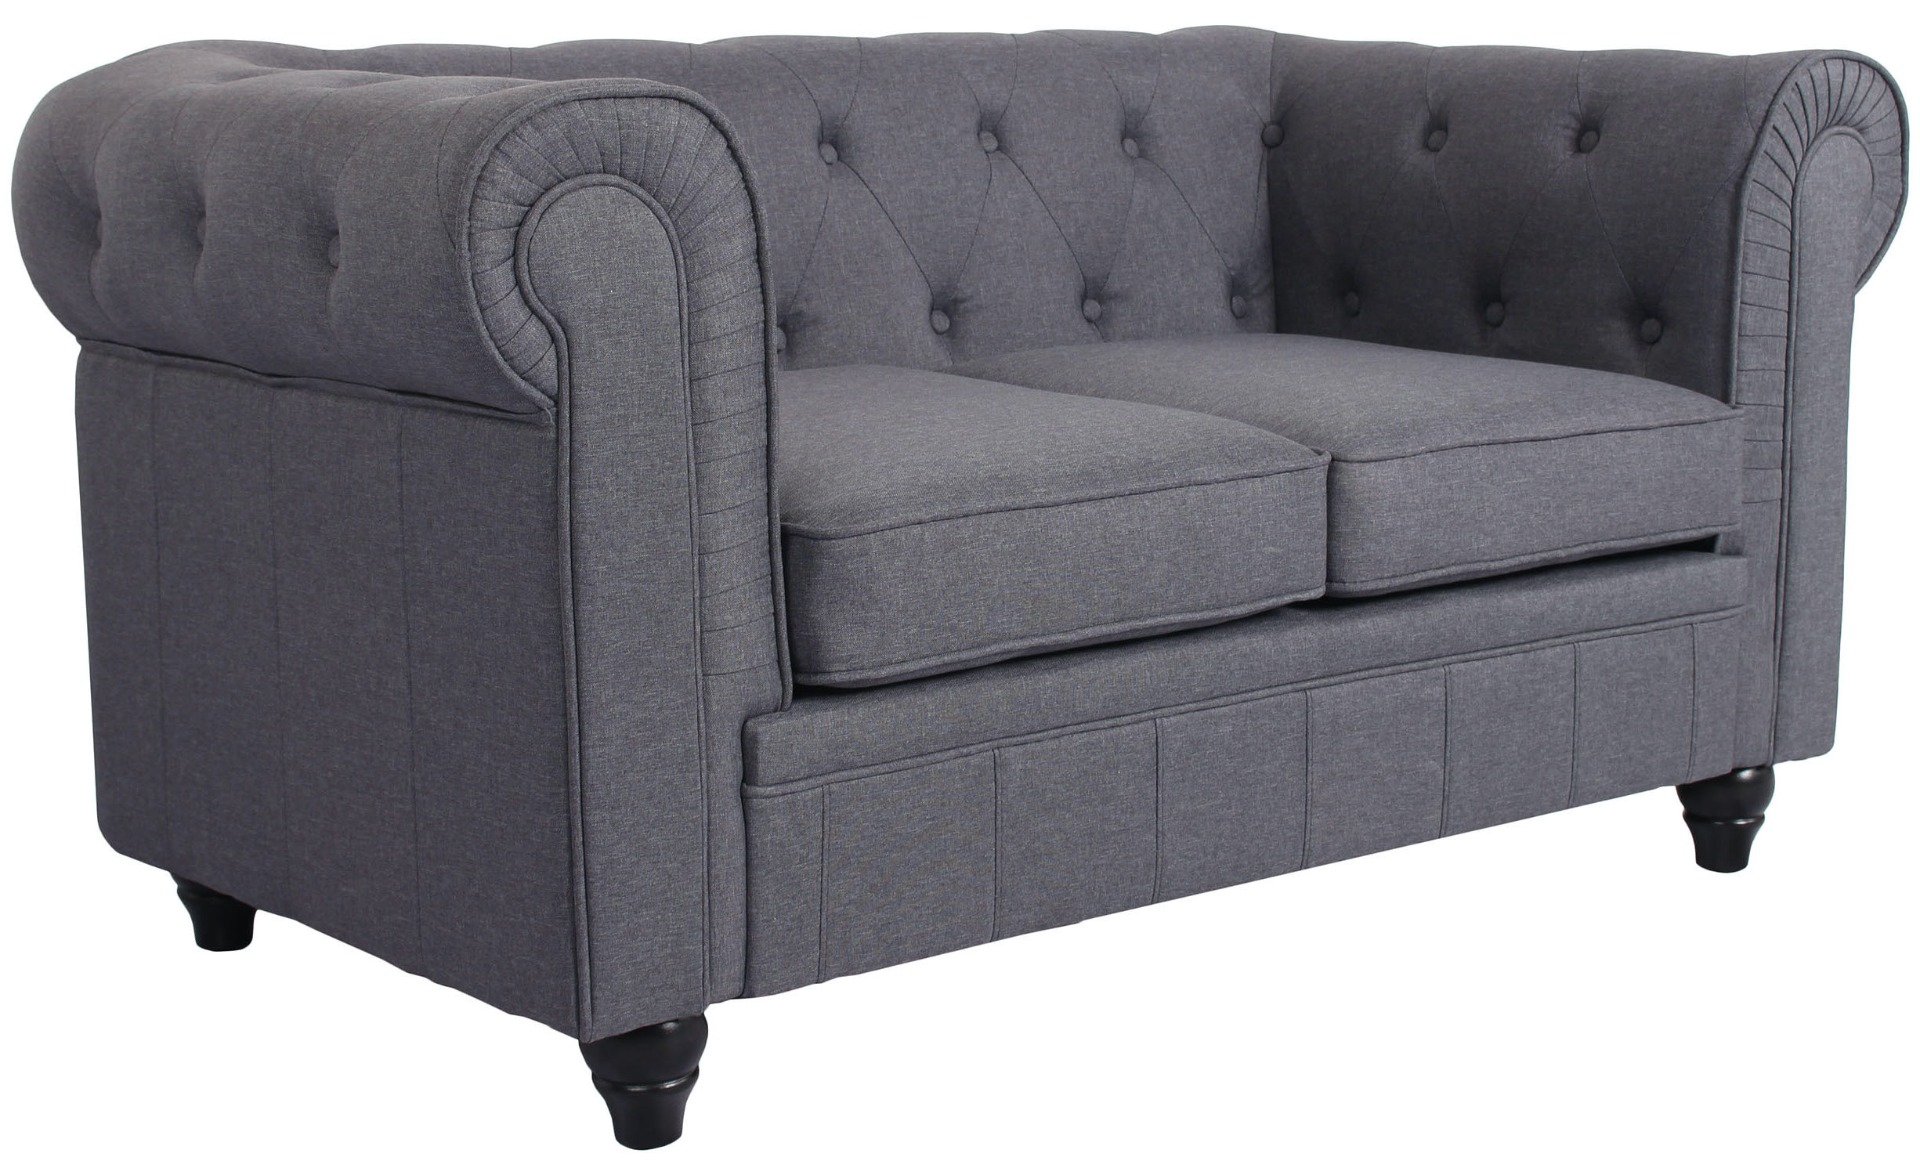 Grand Canapé Chesterfield 2-Sitzer Sofa mit Leinen Effekt Grau